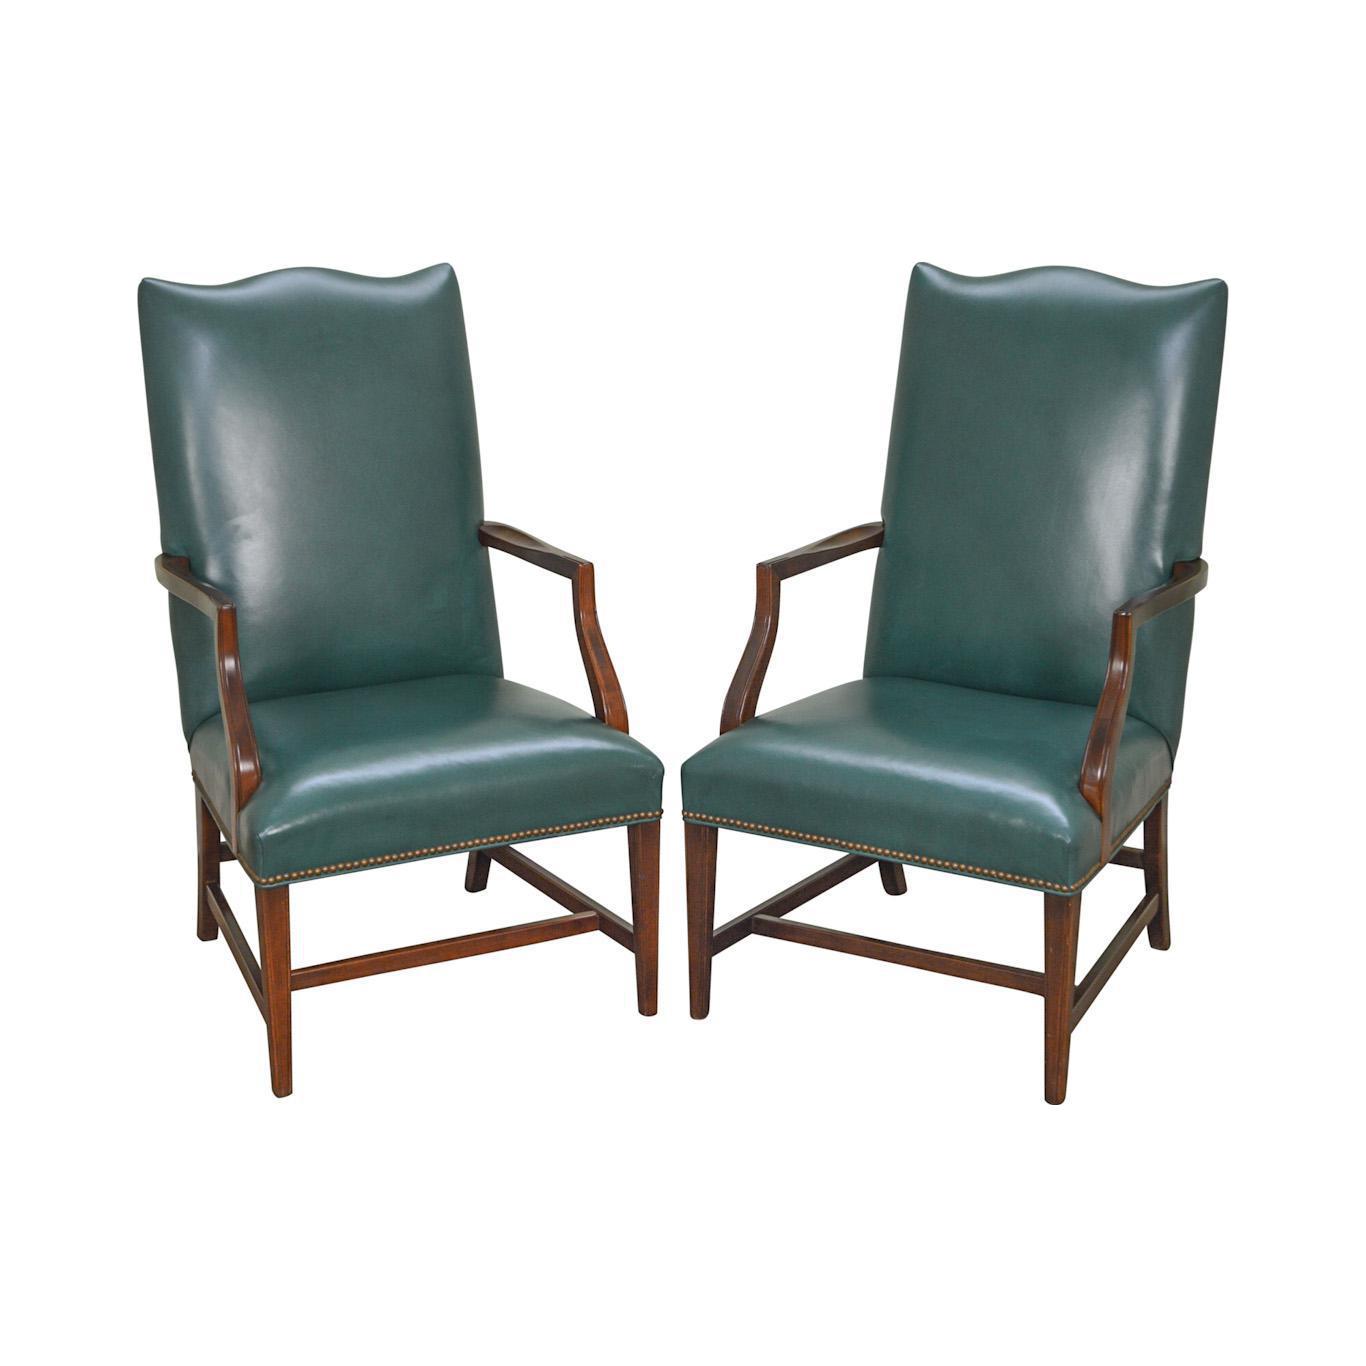 Genial Hepplewhite Style Green Leather Martha Washington Lolling Arm Chairs   A  Pair